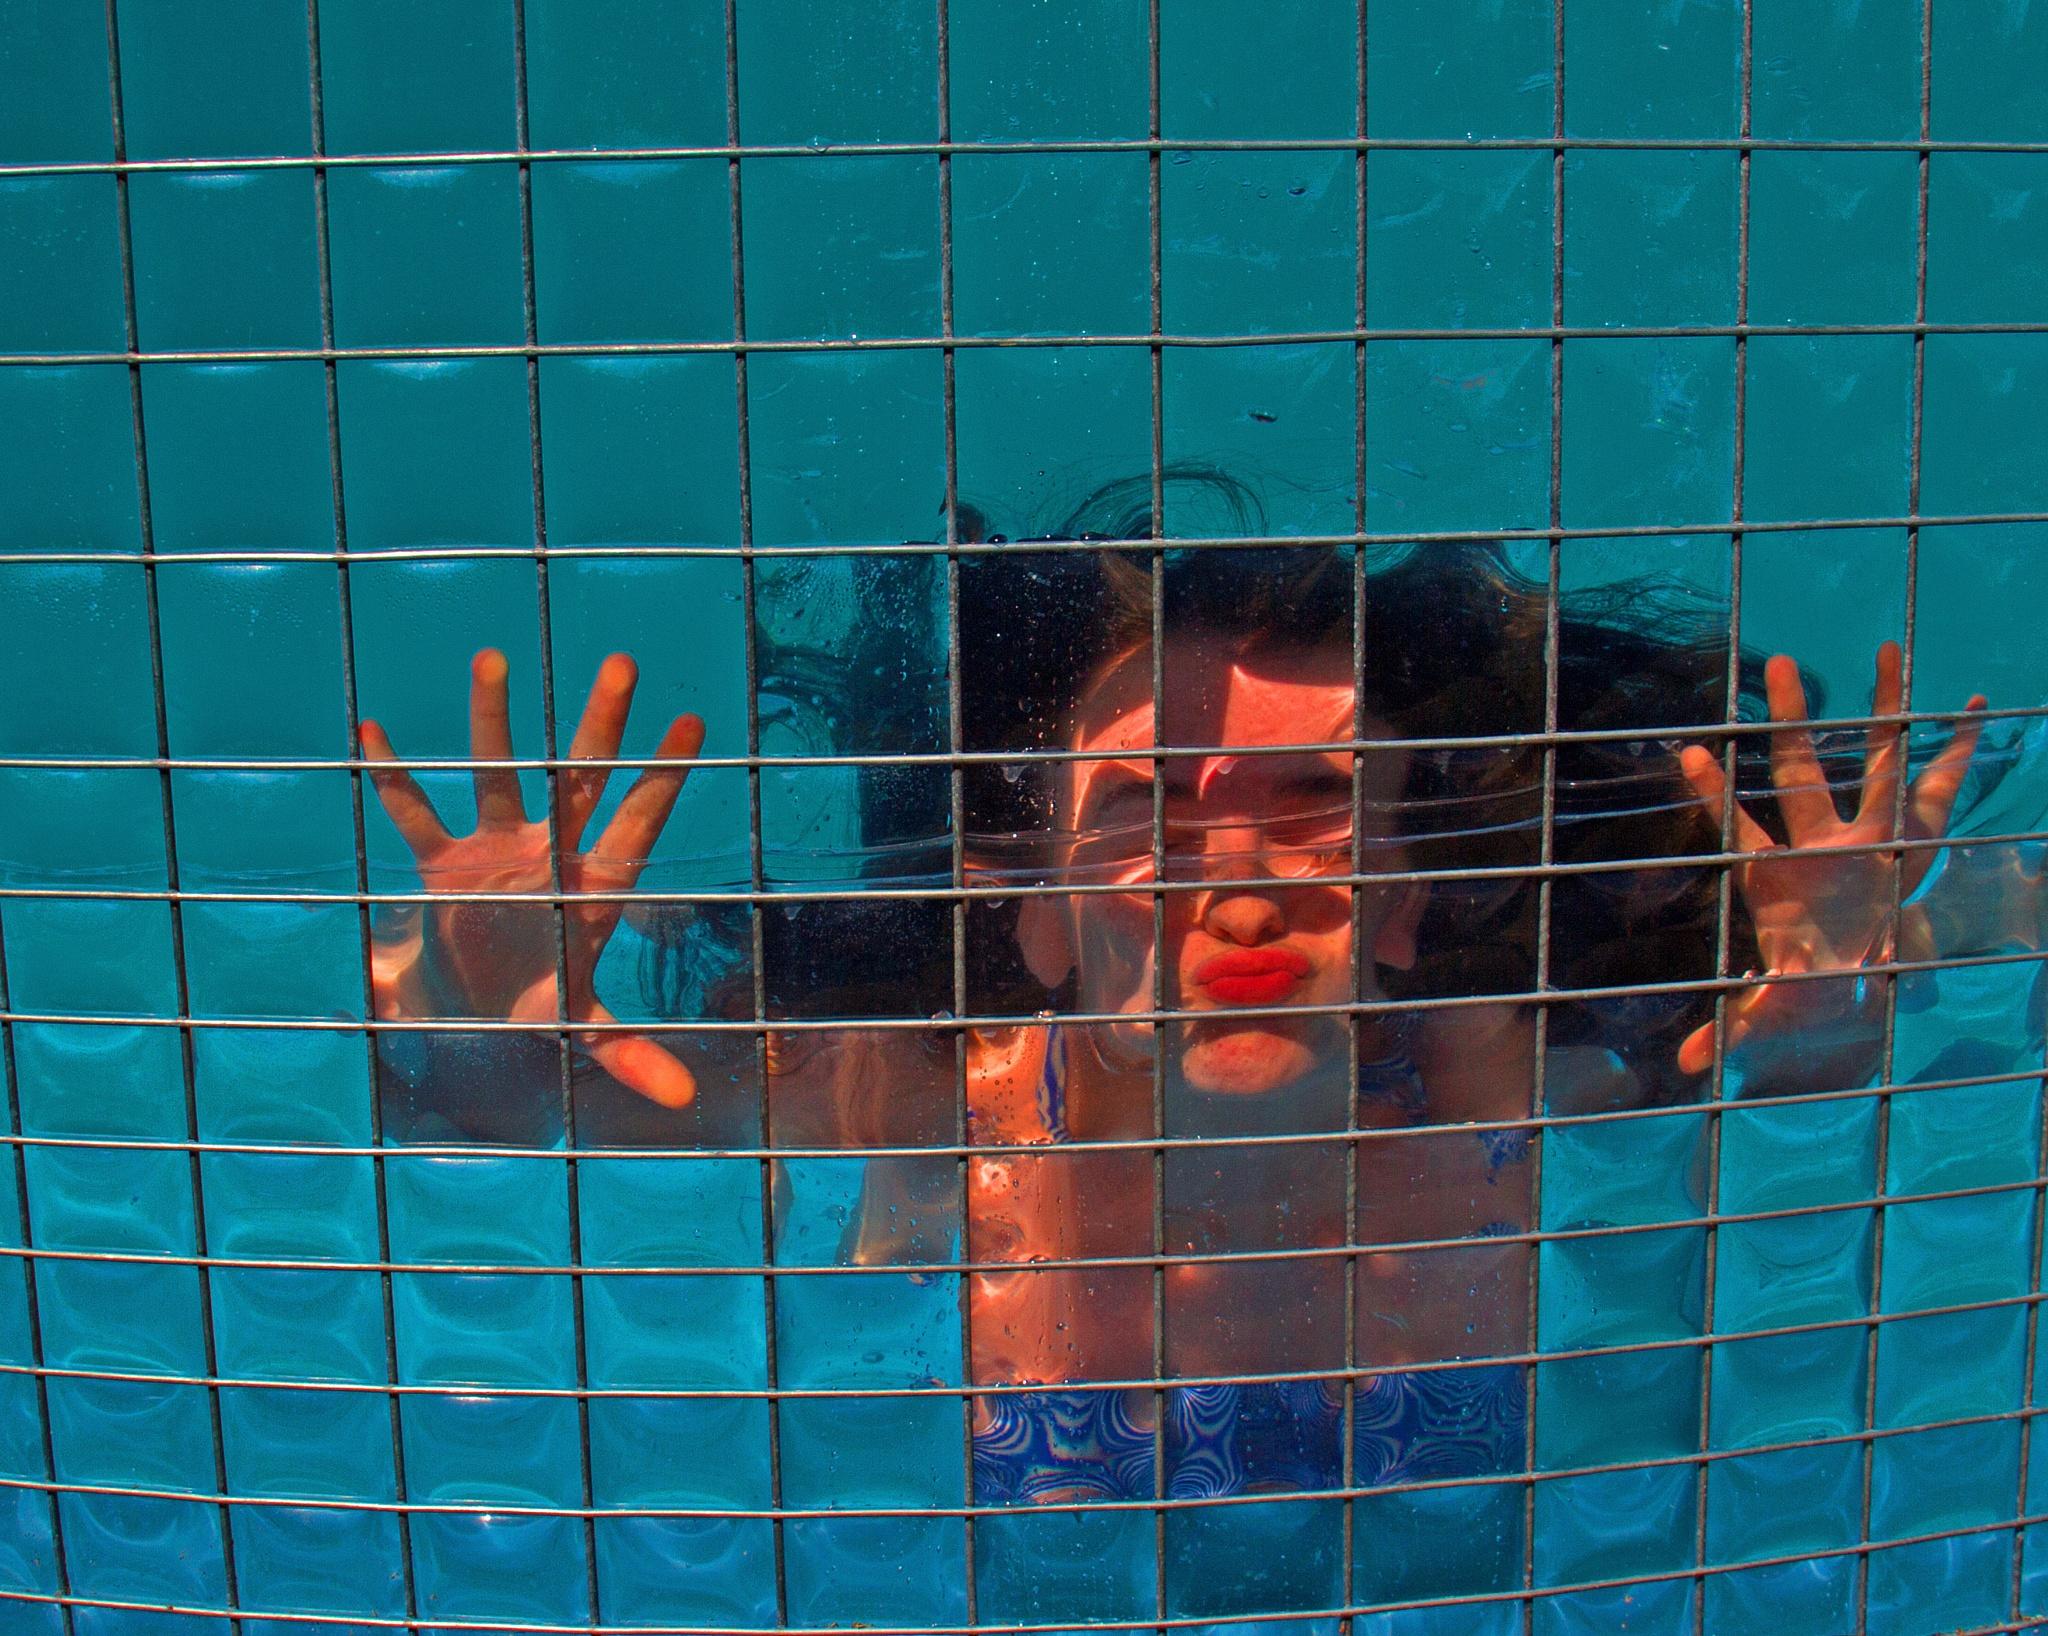 mermaid in cage by Nauta Piscatorque